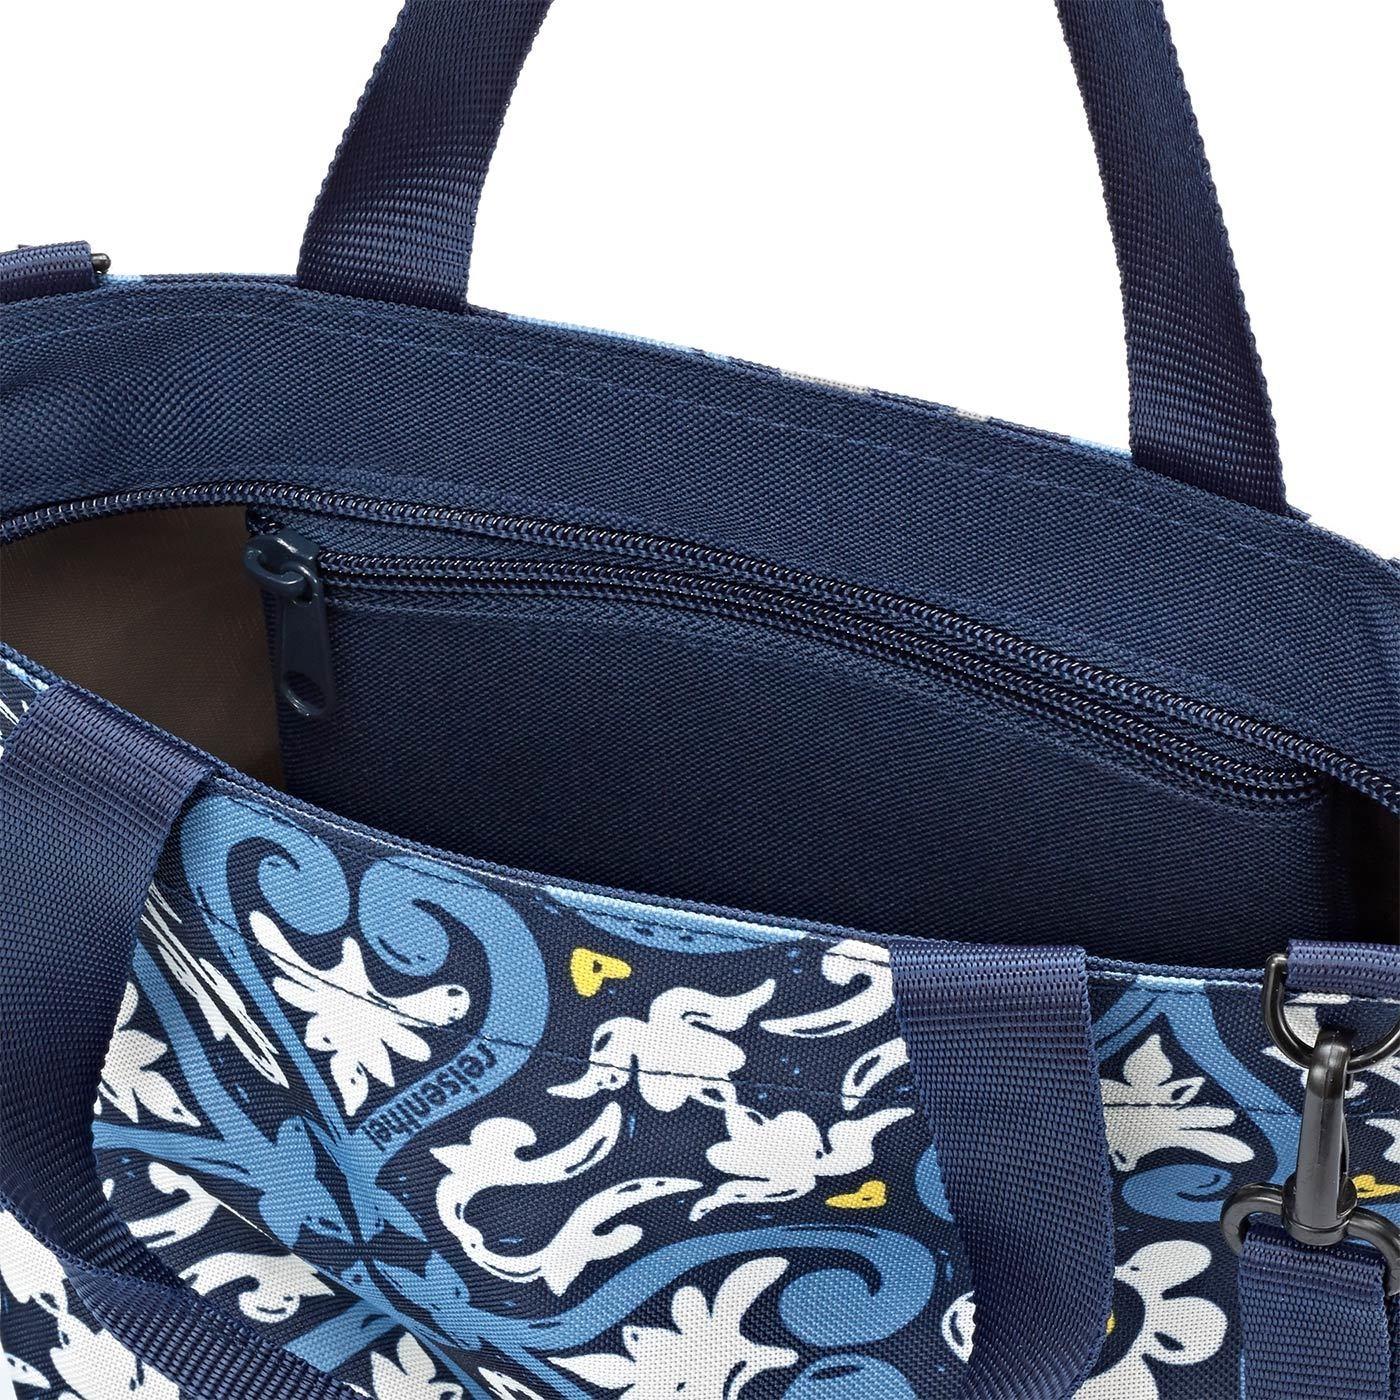 Taška/kabelka Shopper XS floral 1_0